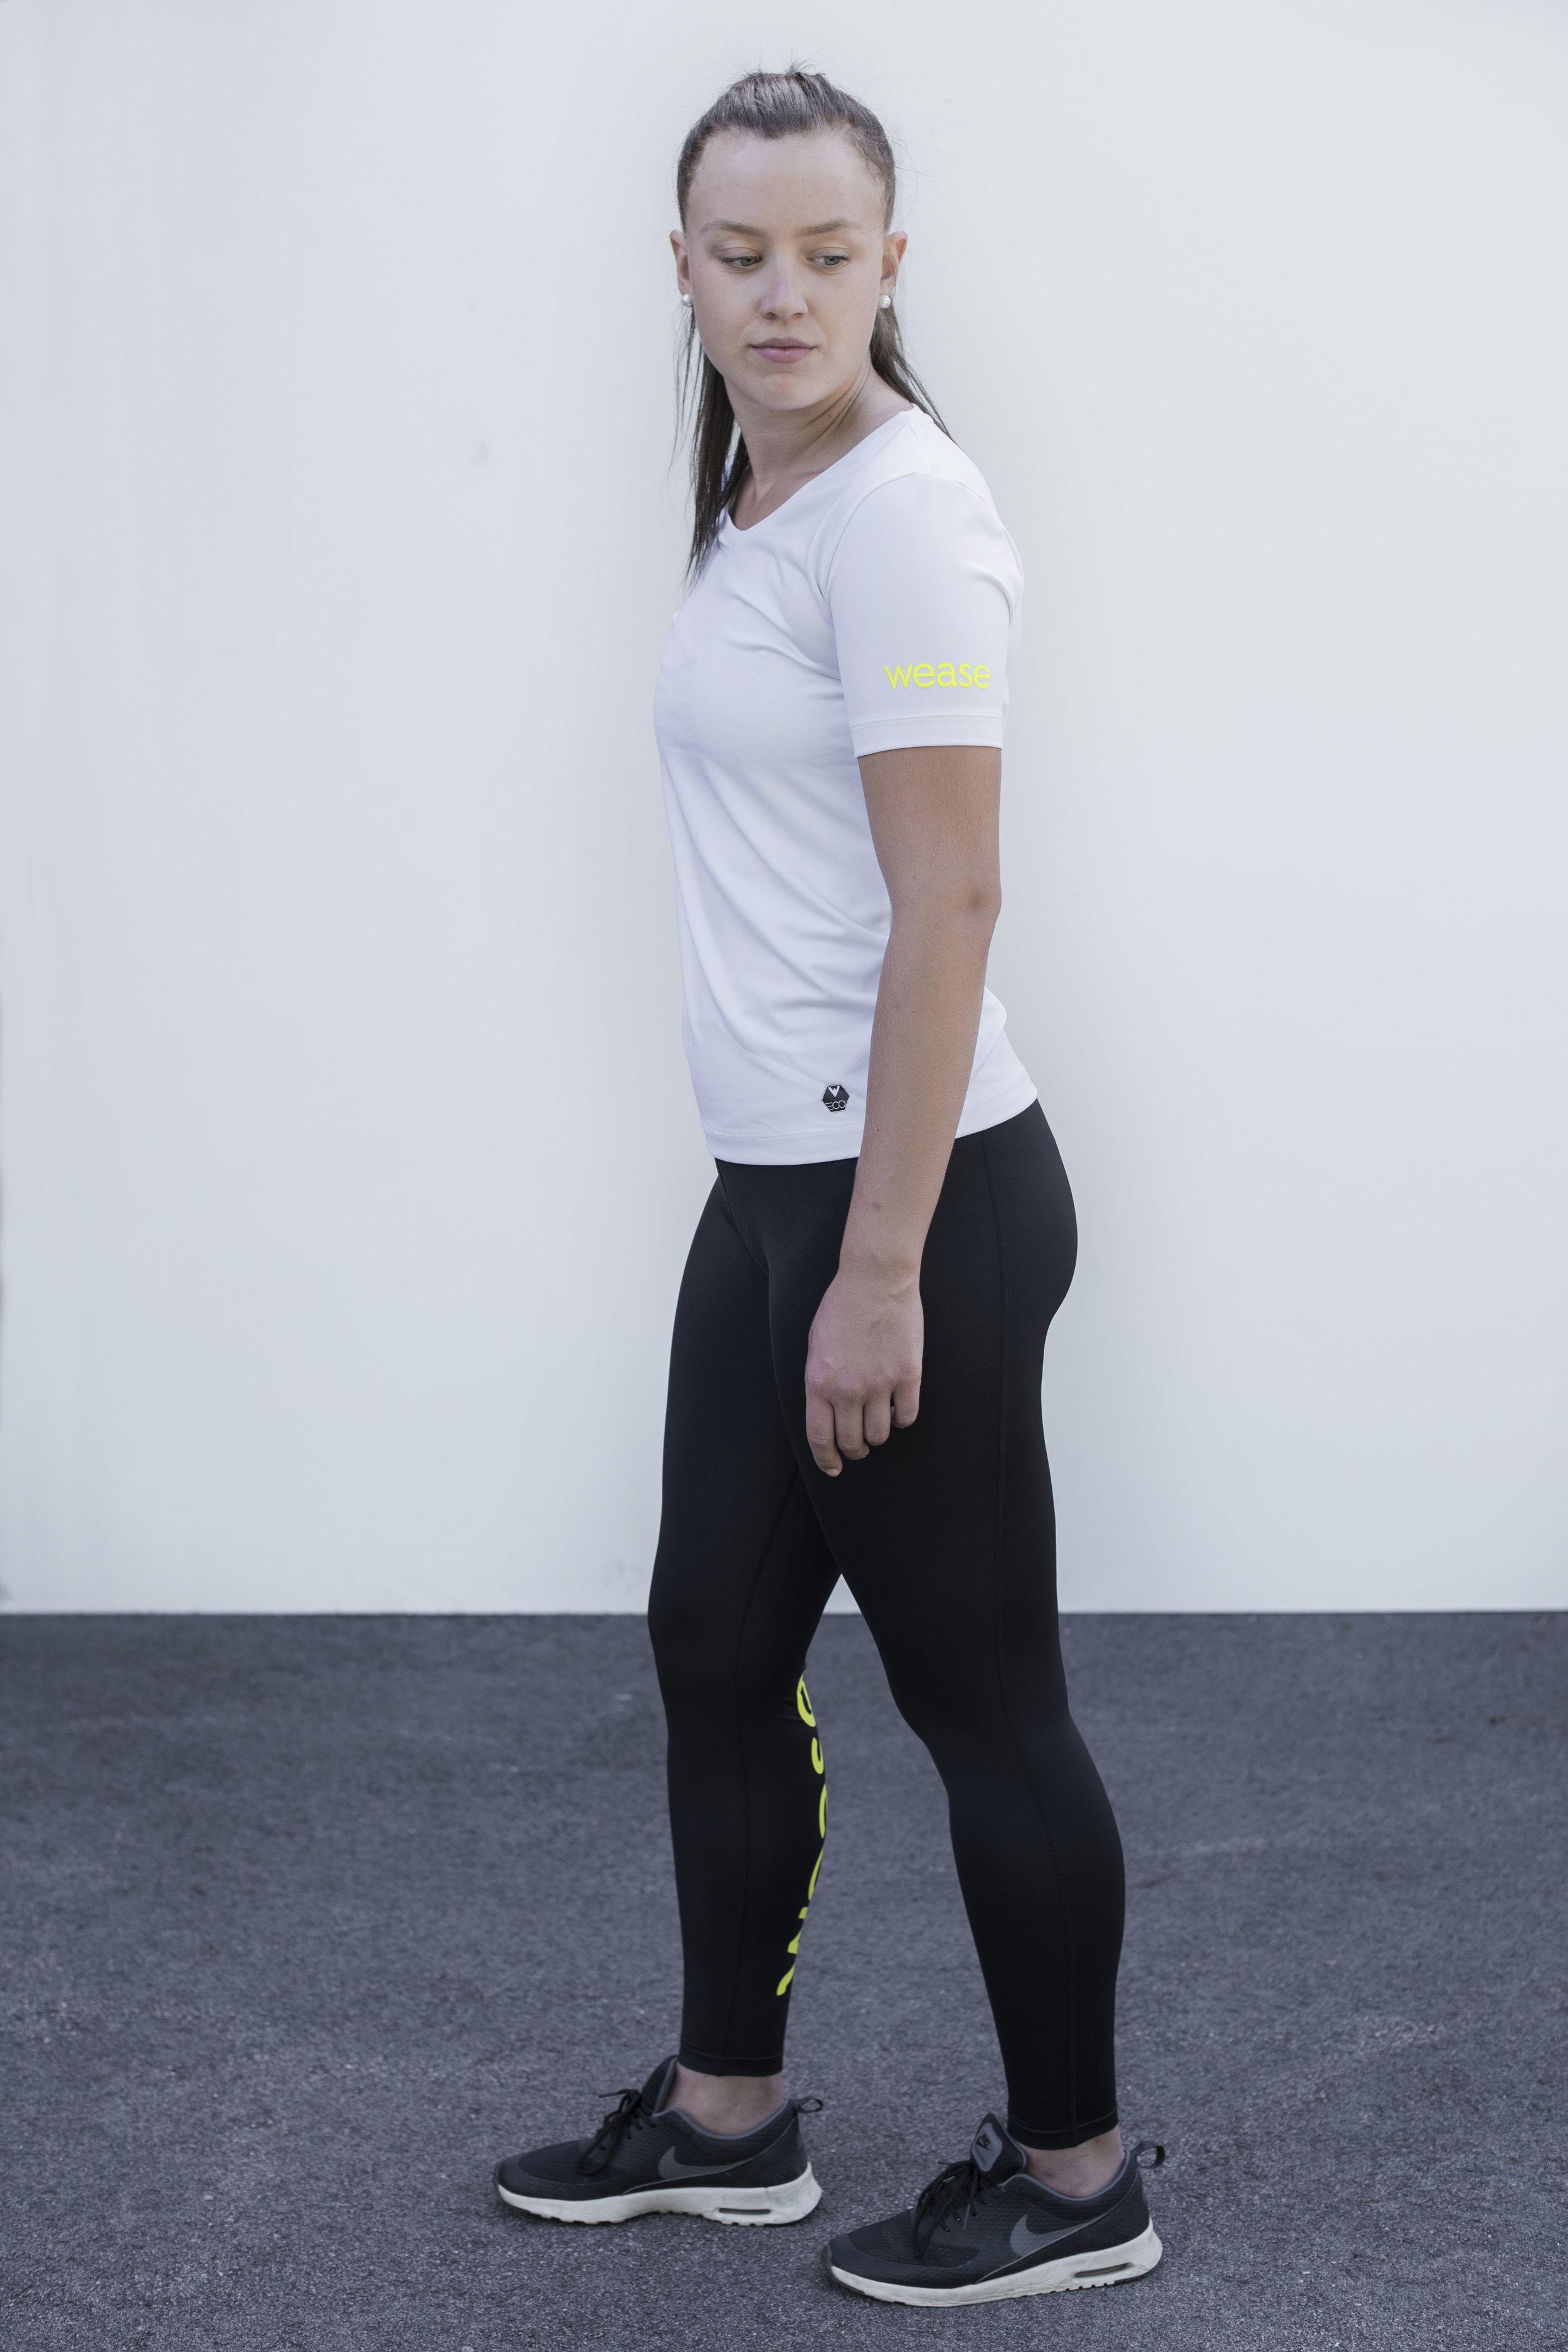 cecilia czarnecki triathlon